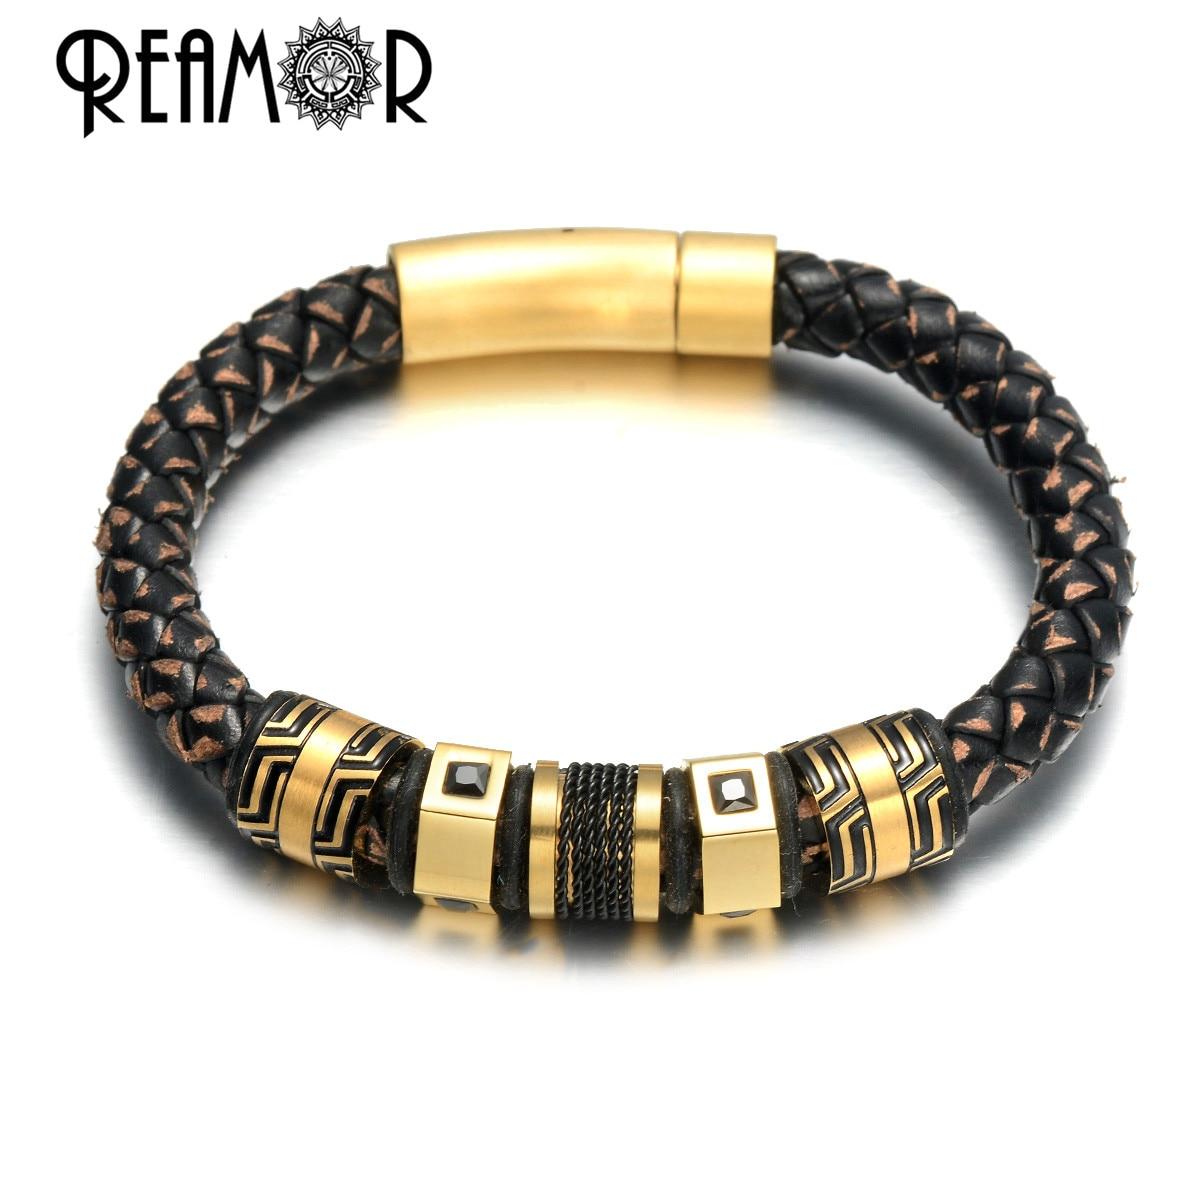 REAMOR Luxury Stainless Steel Black Zircon Gold Beads Charm Bracelets For Men Handmade Genuine Leather Braided Bangle Jewelry